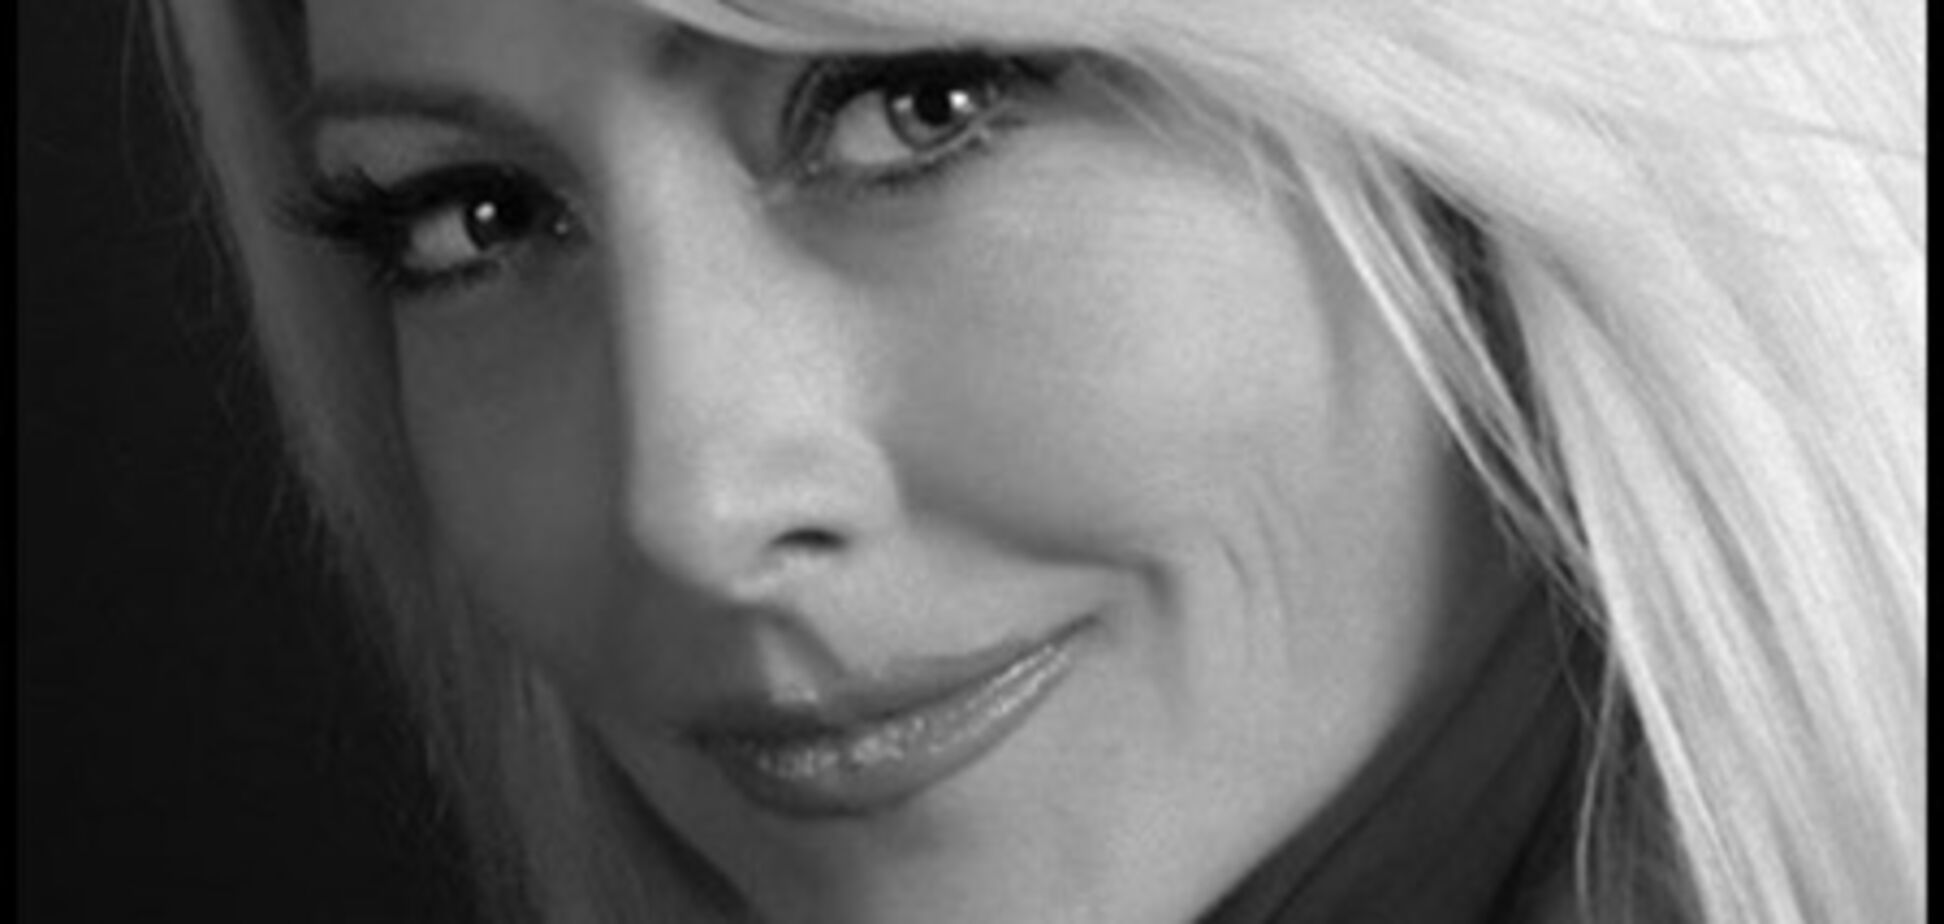 Певица Оксана Хожай умерла. Видео